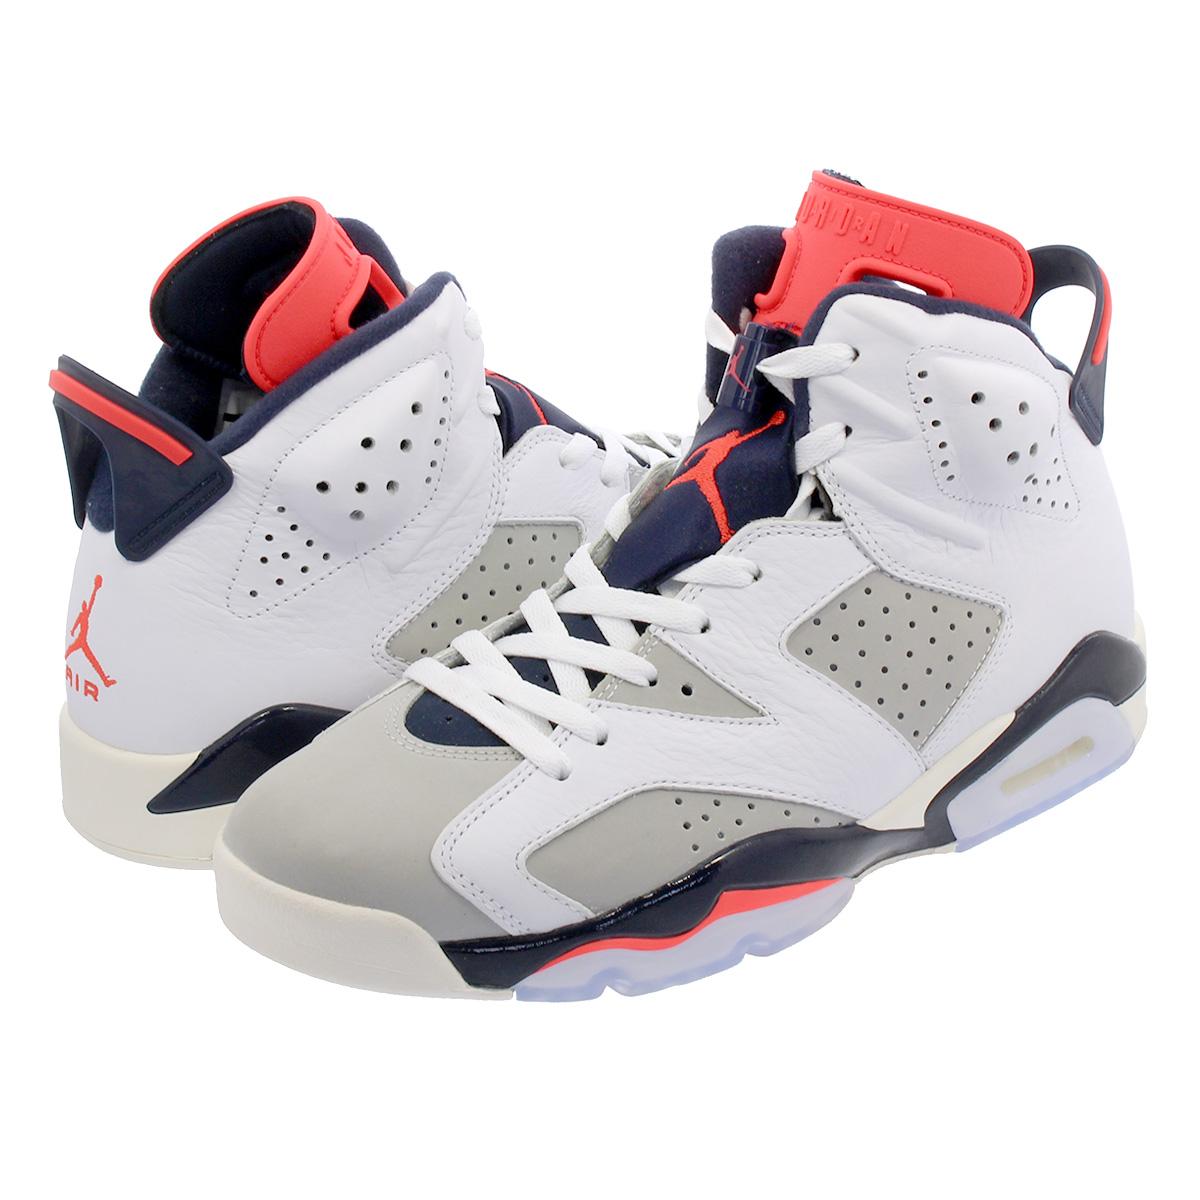 91f062381d5 NIKE AIR JORDAN 6 RETRO Nike Air Jordan 6 nostalgic WHITE/INFRARED 23/GREY  ...